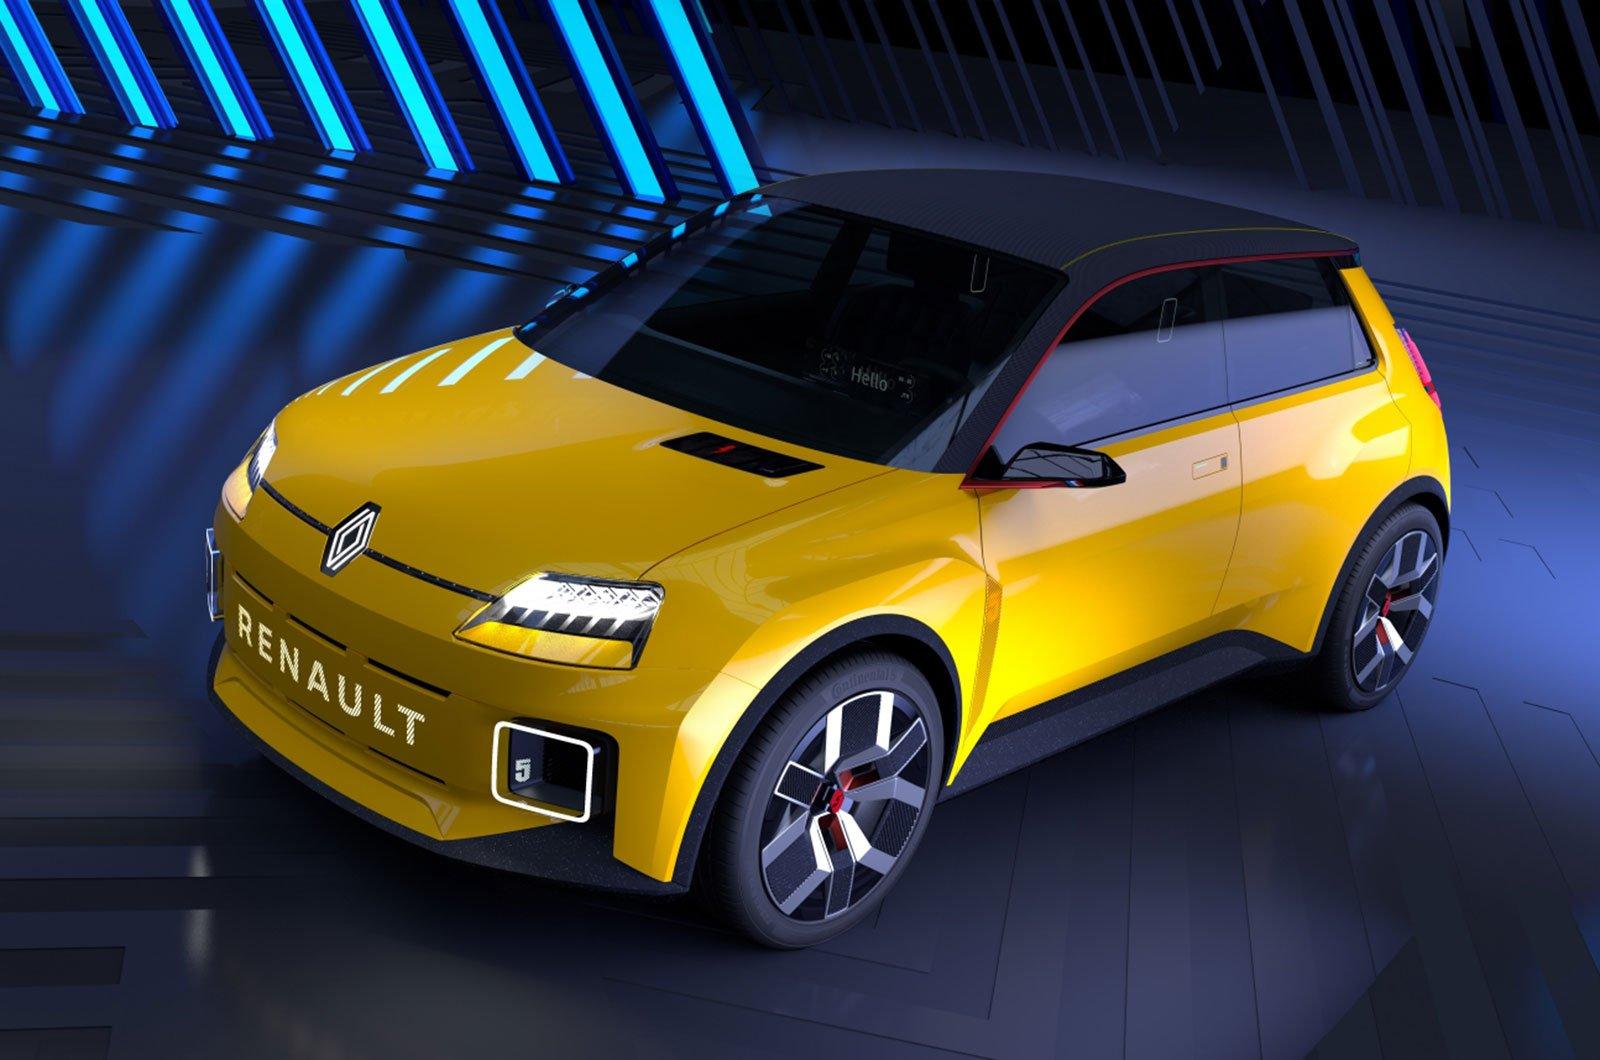 Renault 5 concept rear